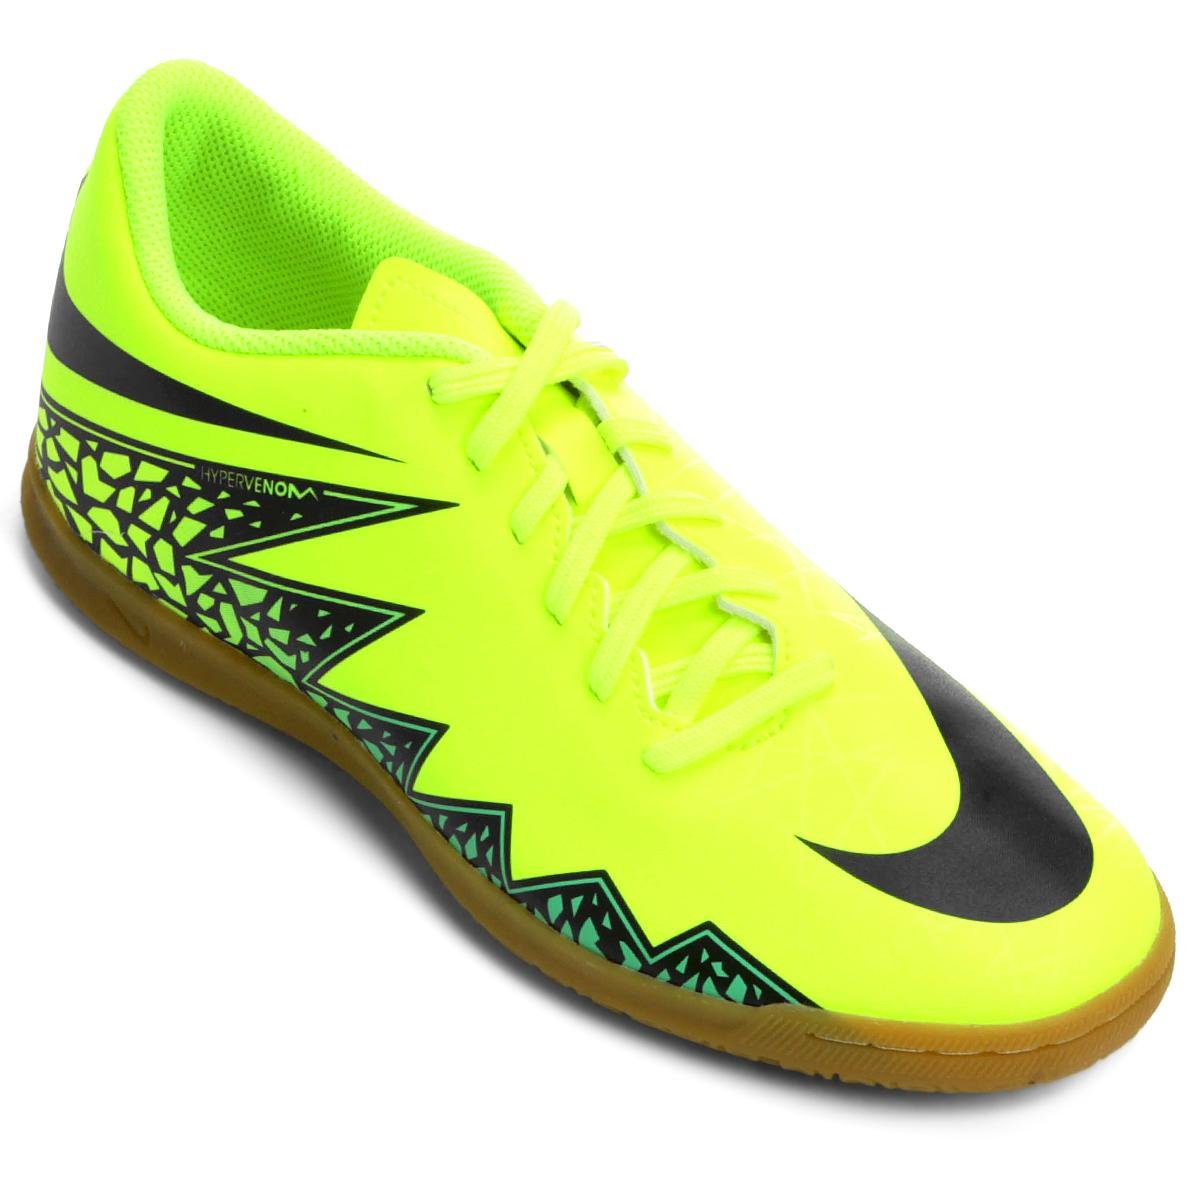 Chuteira Nike Hypervenom Phade 2 IC Futsal Verde Limo e Preto ed189b8297636